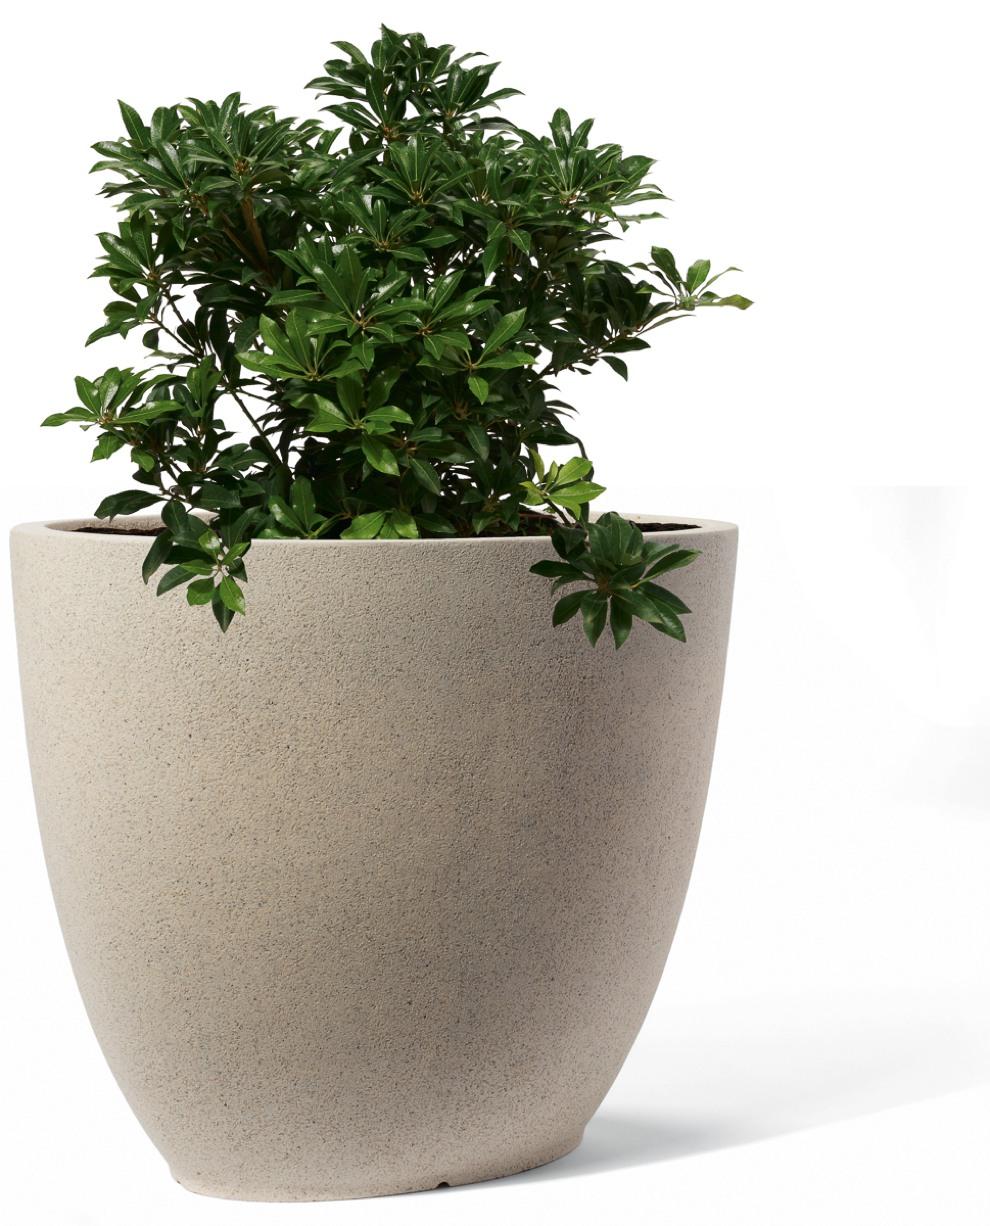 canberra-white-pflanzkuebel-artline-stone-stimmungsbild